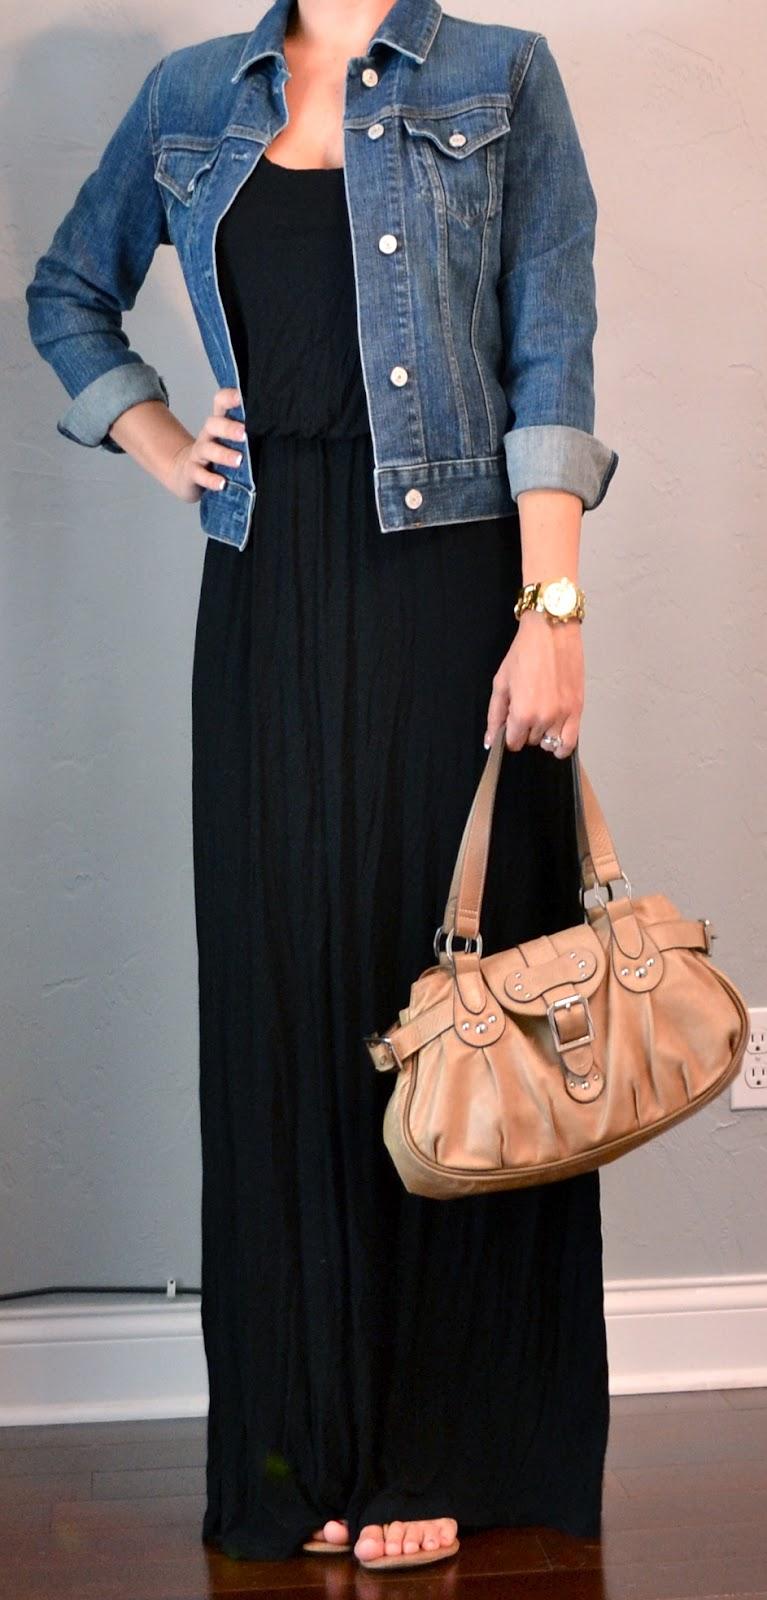 outfit post: black maxi dress, jean jacket